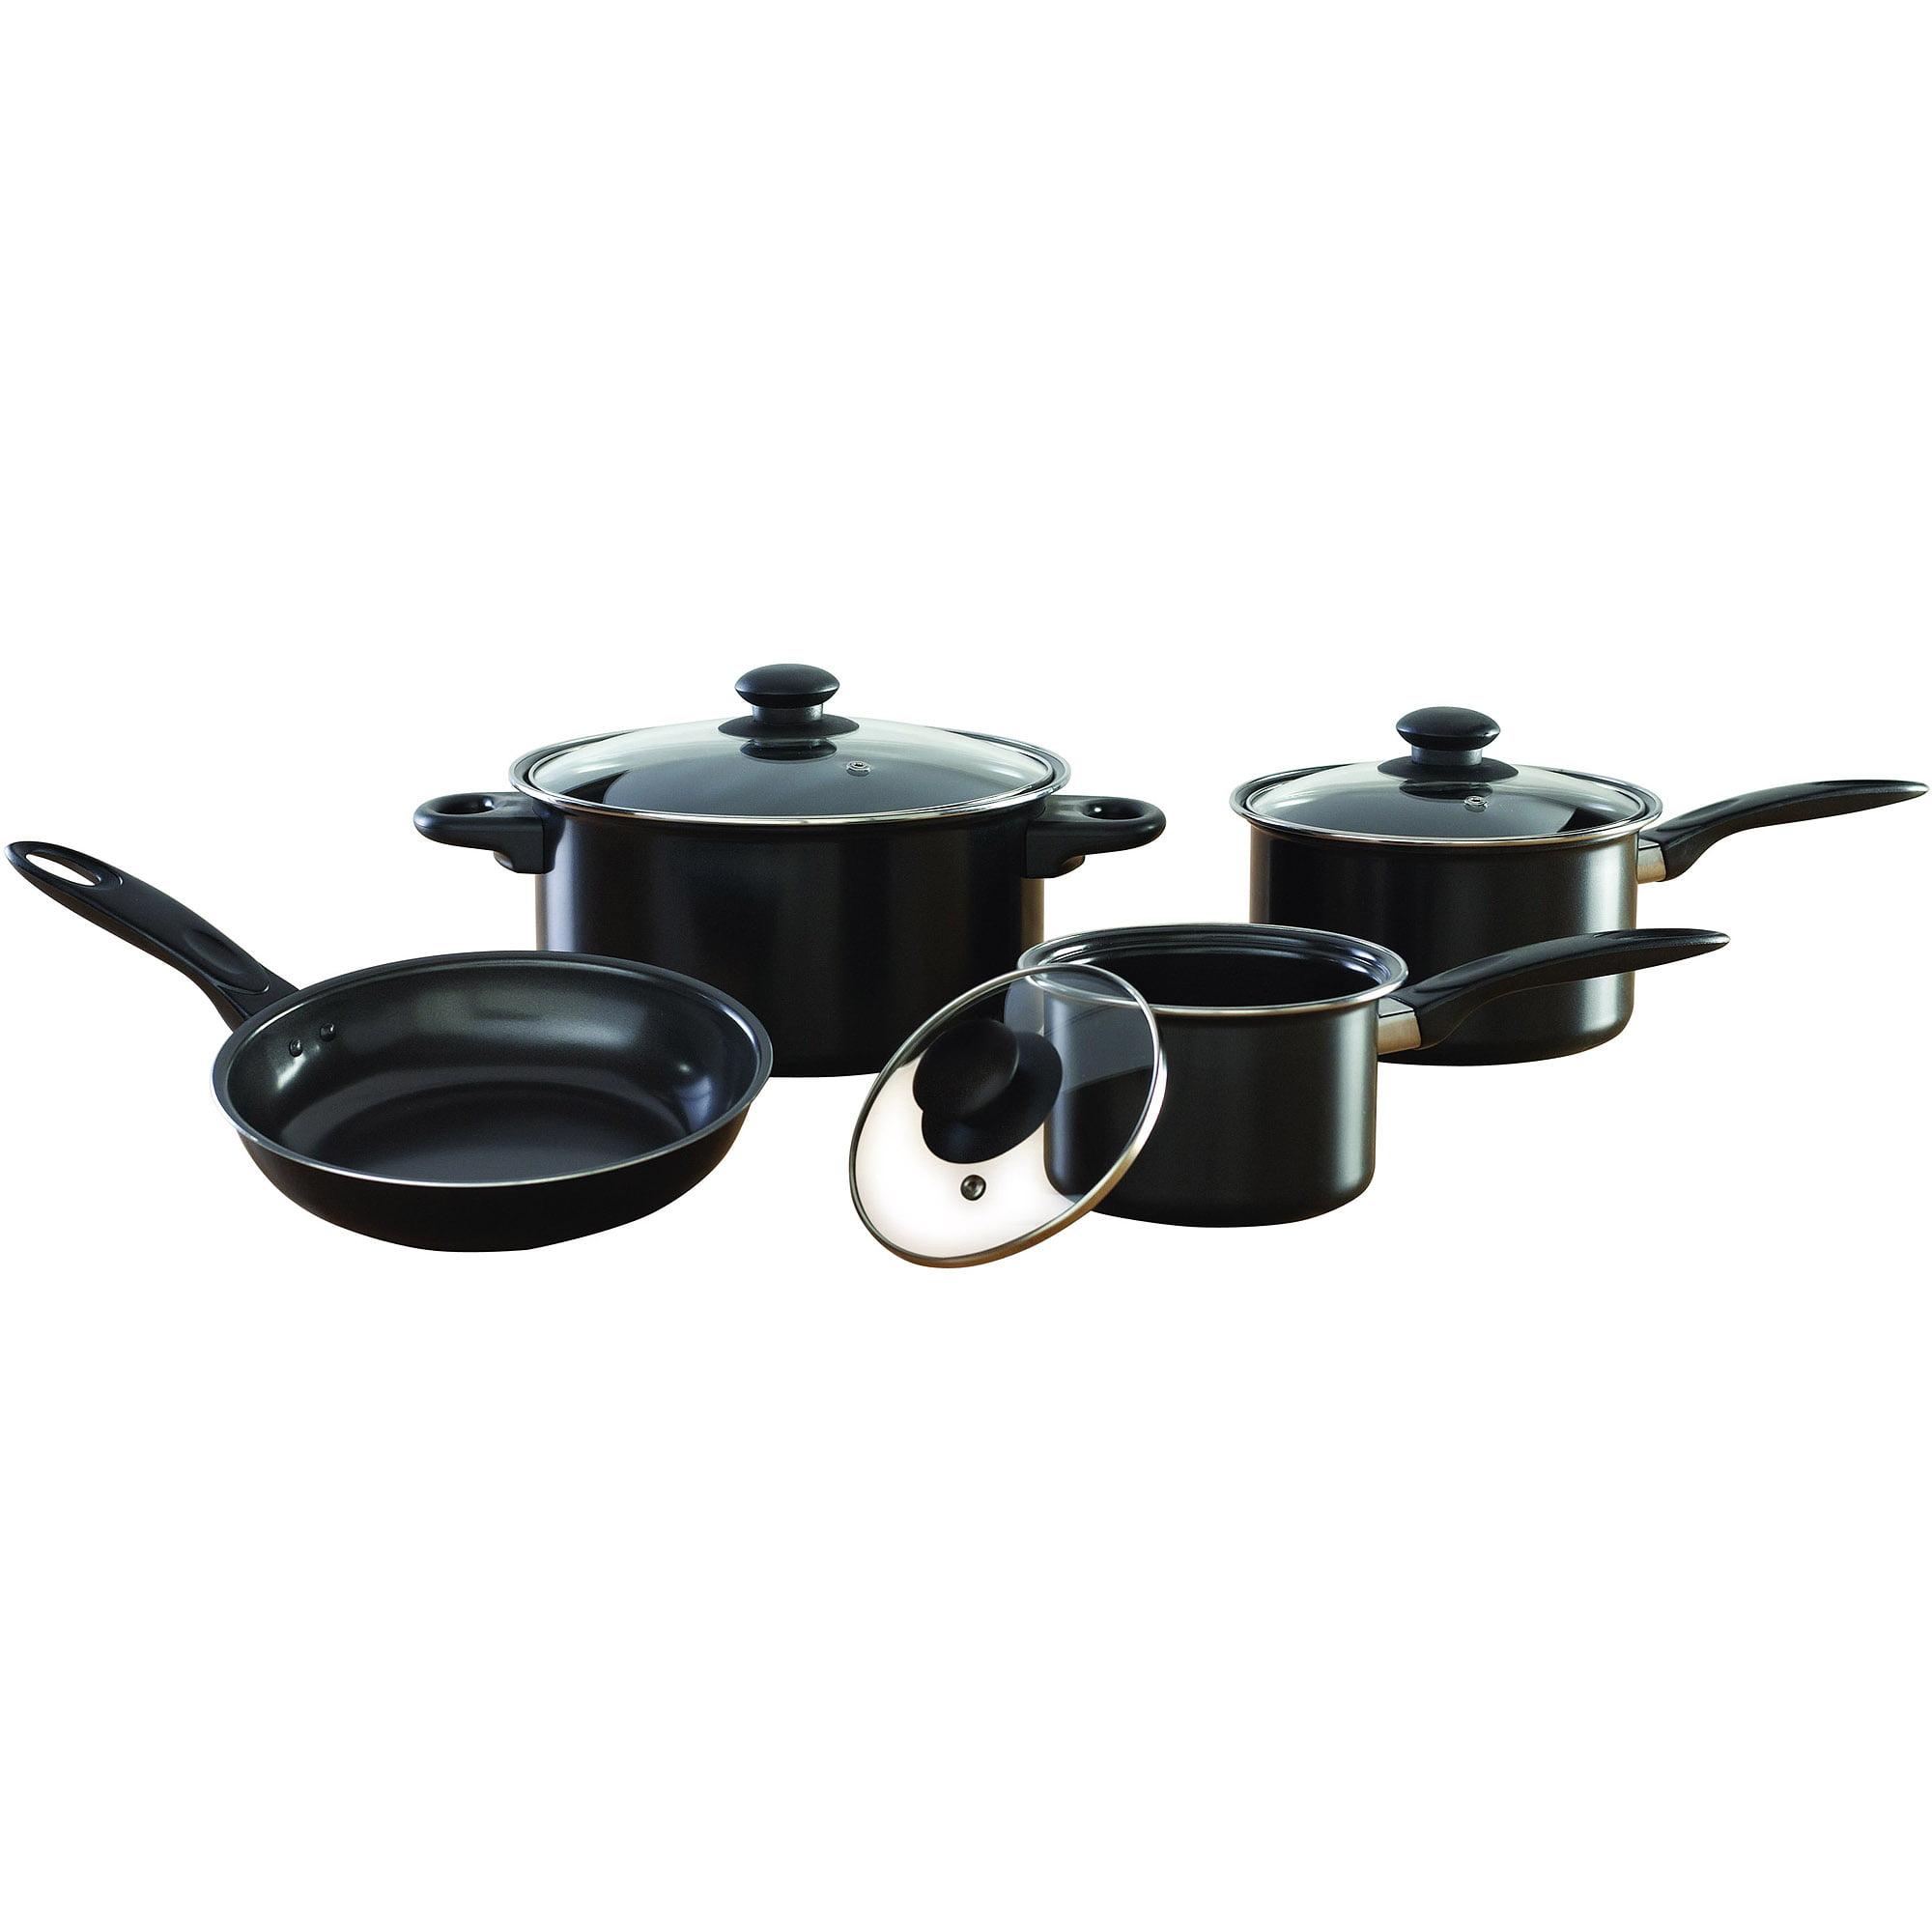 Mainstays 7Piece Nonstick Cookware Set Black Walmartcom